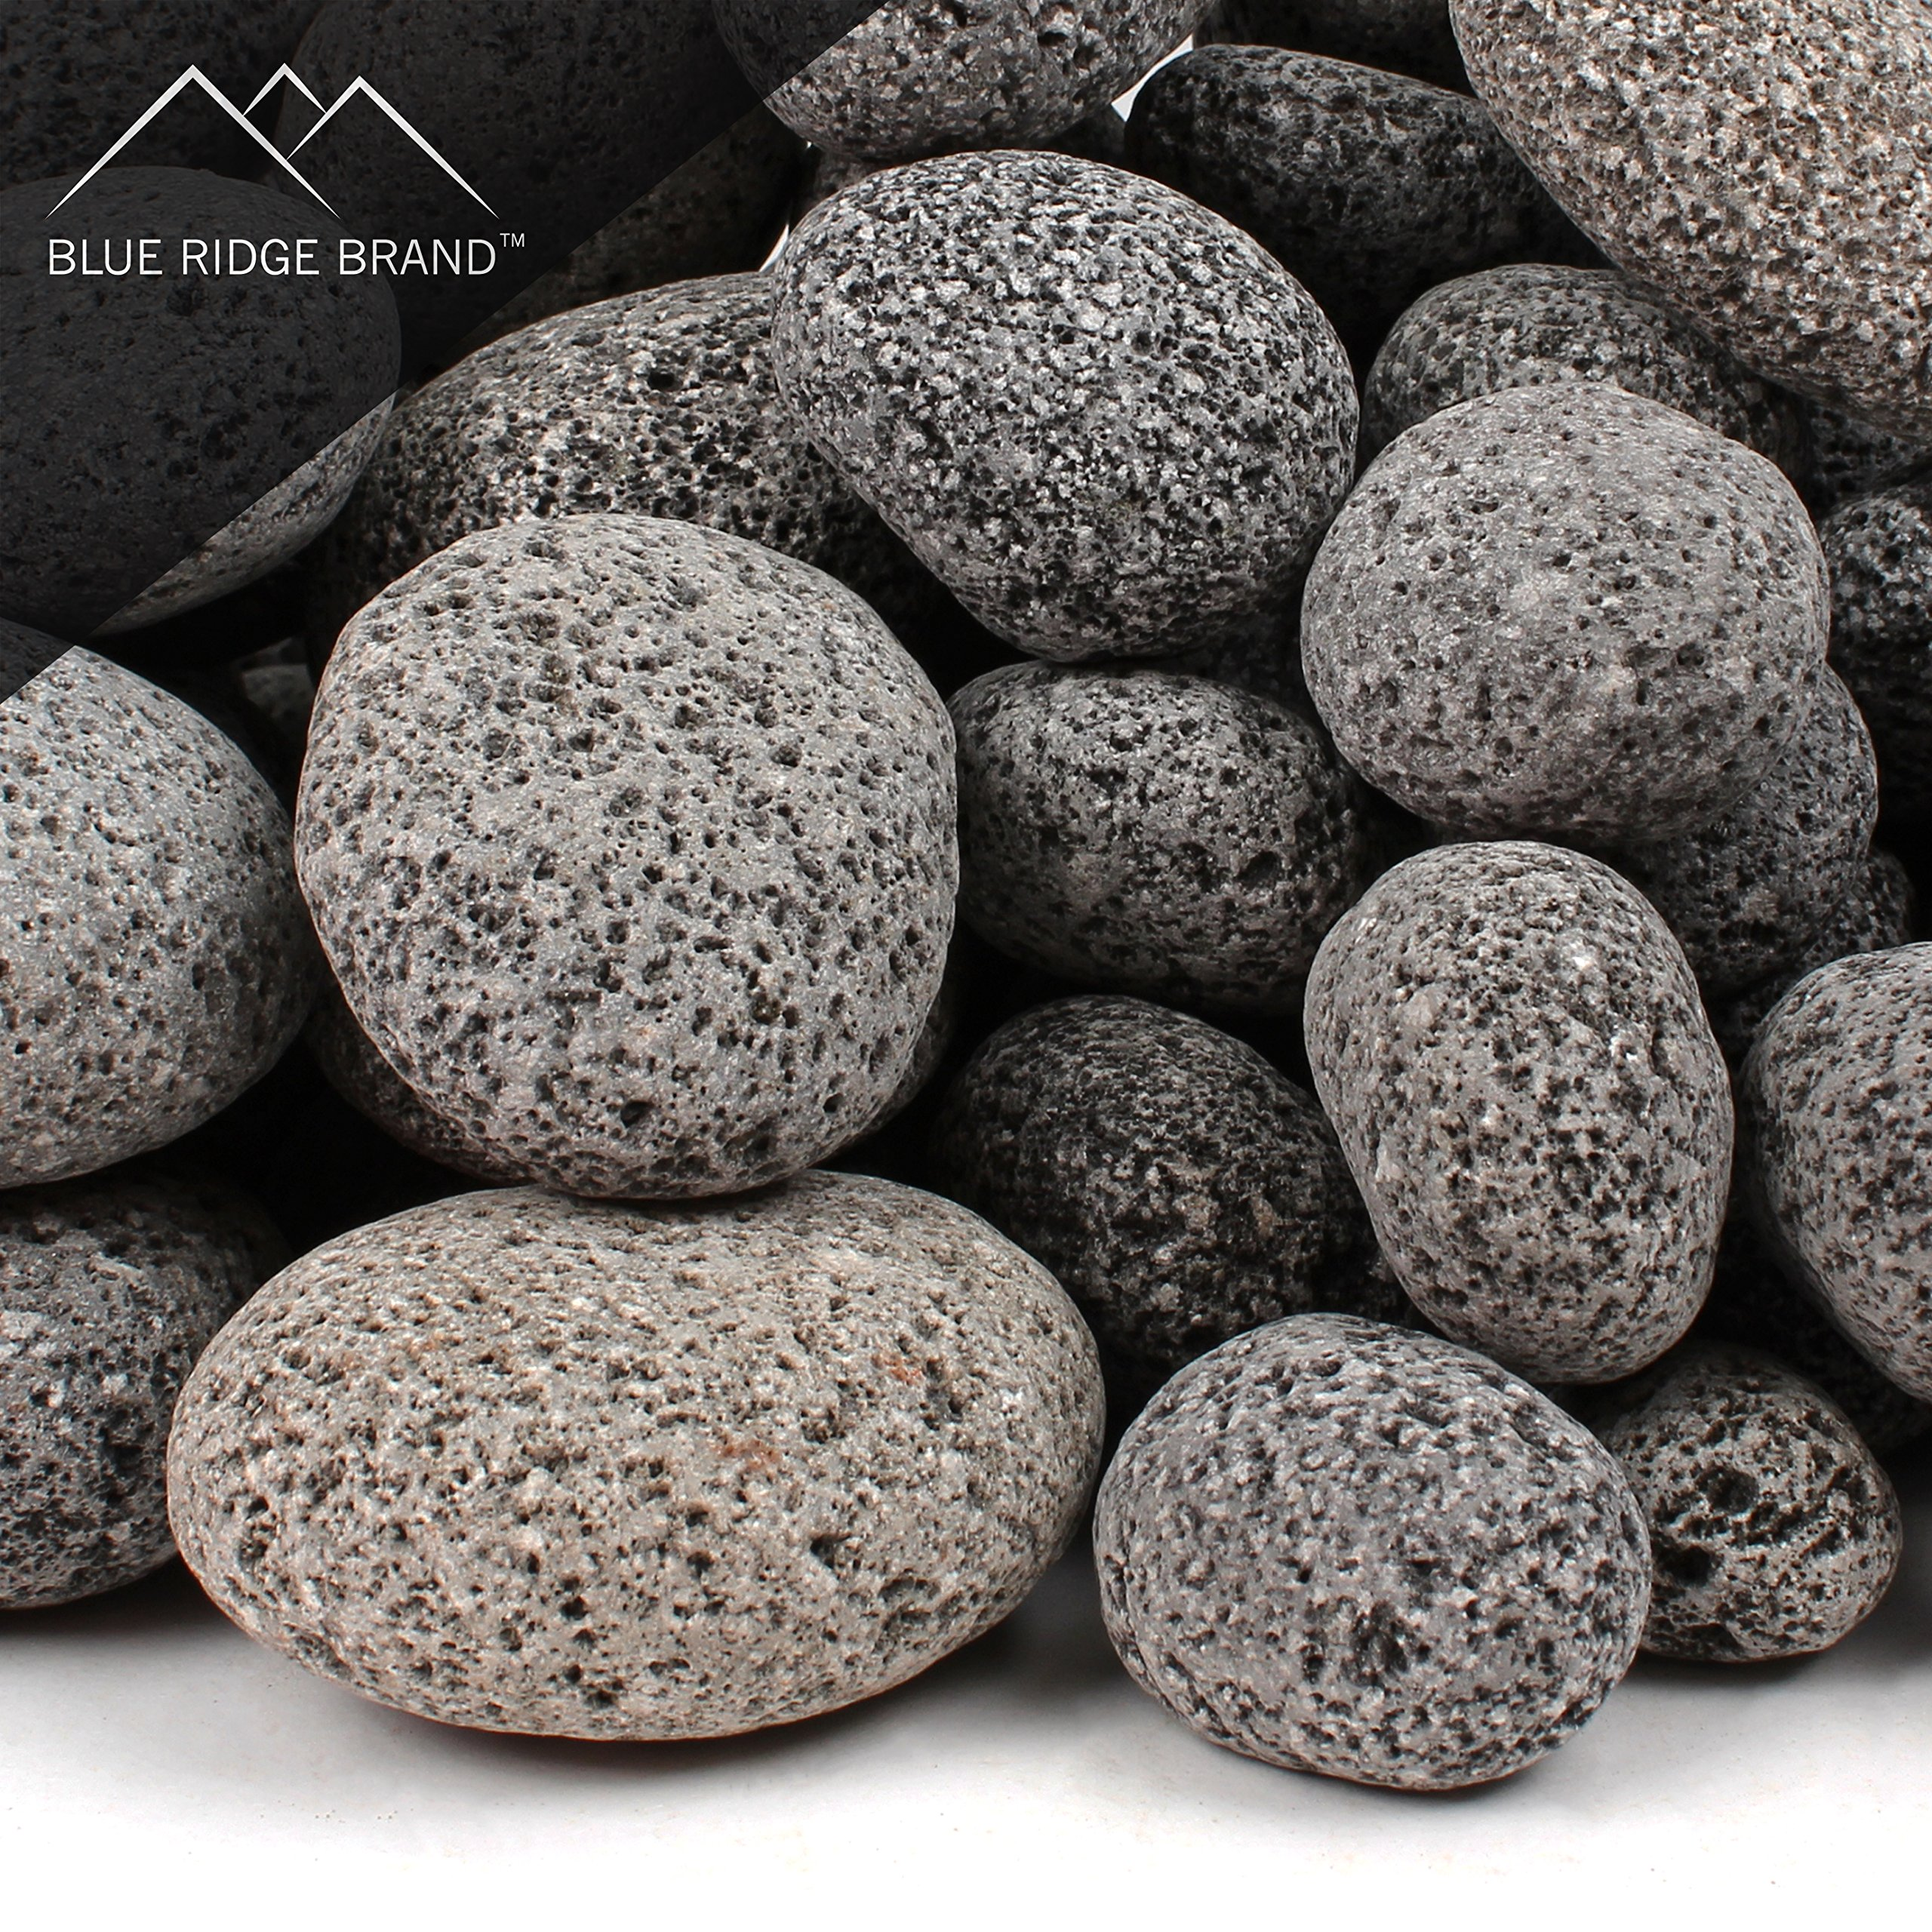 Blue Ridge Brand™ Lava Rock - 50-Pound Tumbled Lava Stone Assortment for Fire Pit - 1'' to 2'' Black/Gray Lava Pebble Mix - Landscaping Rocks